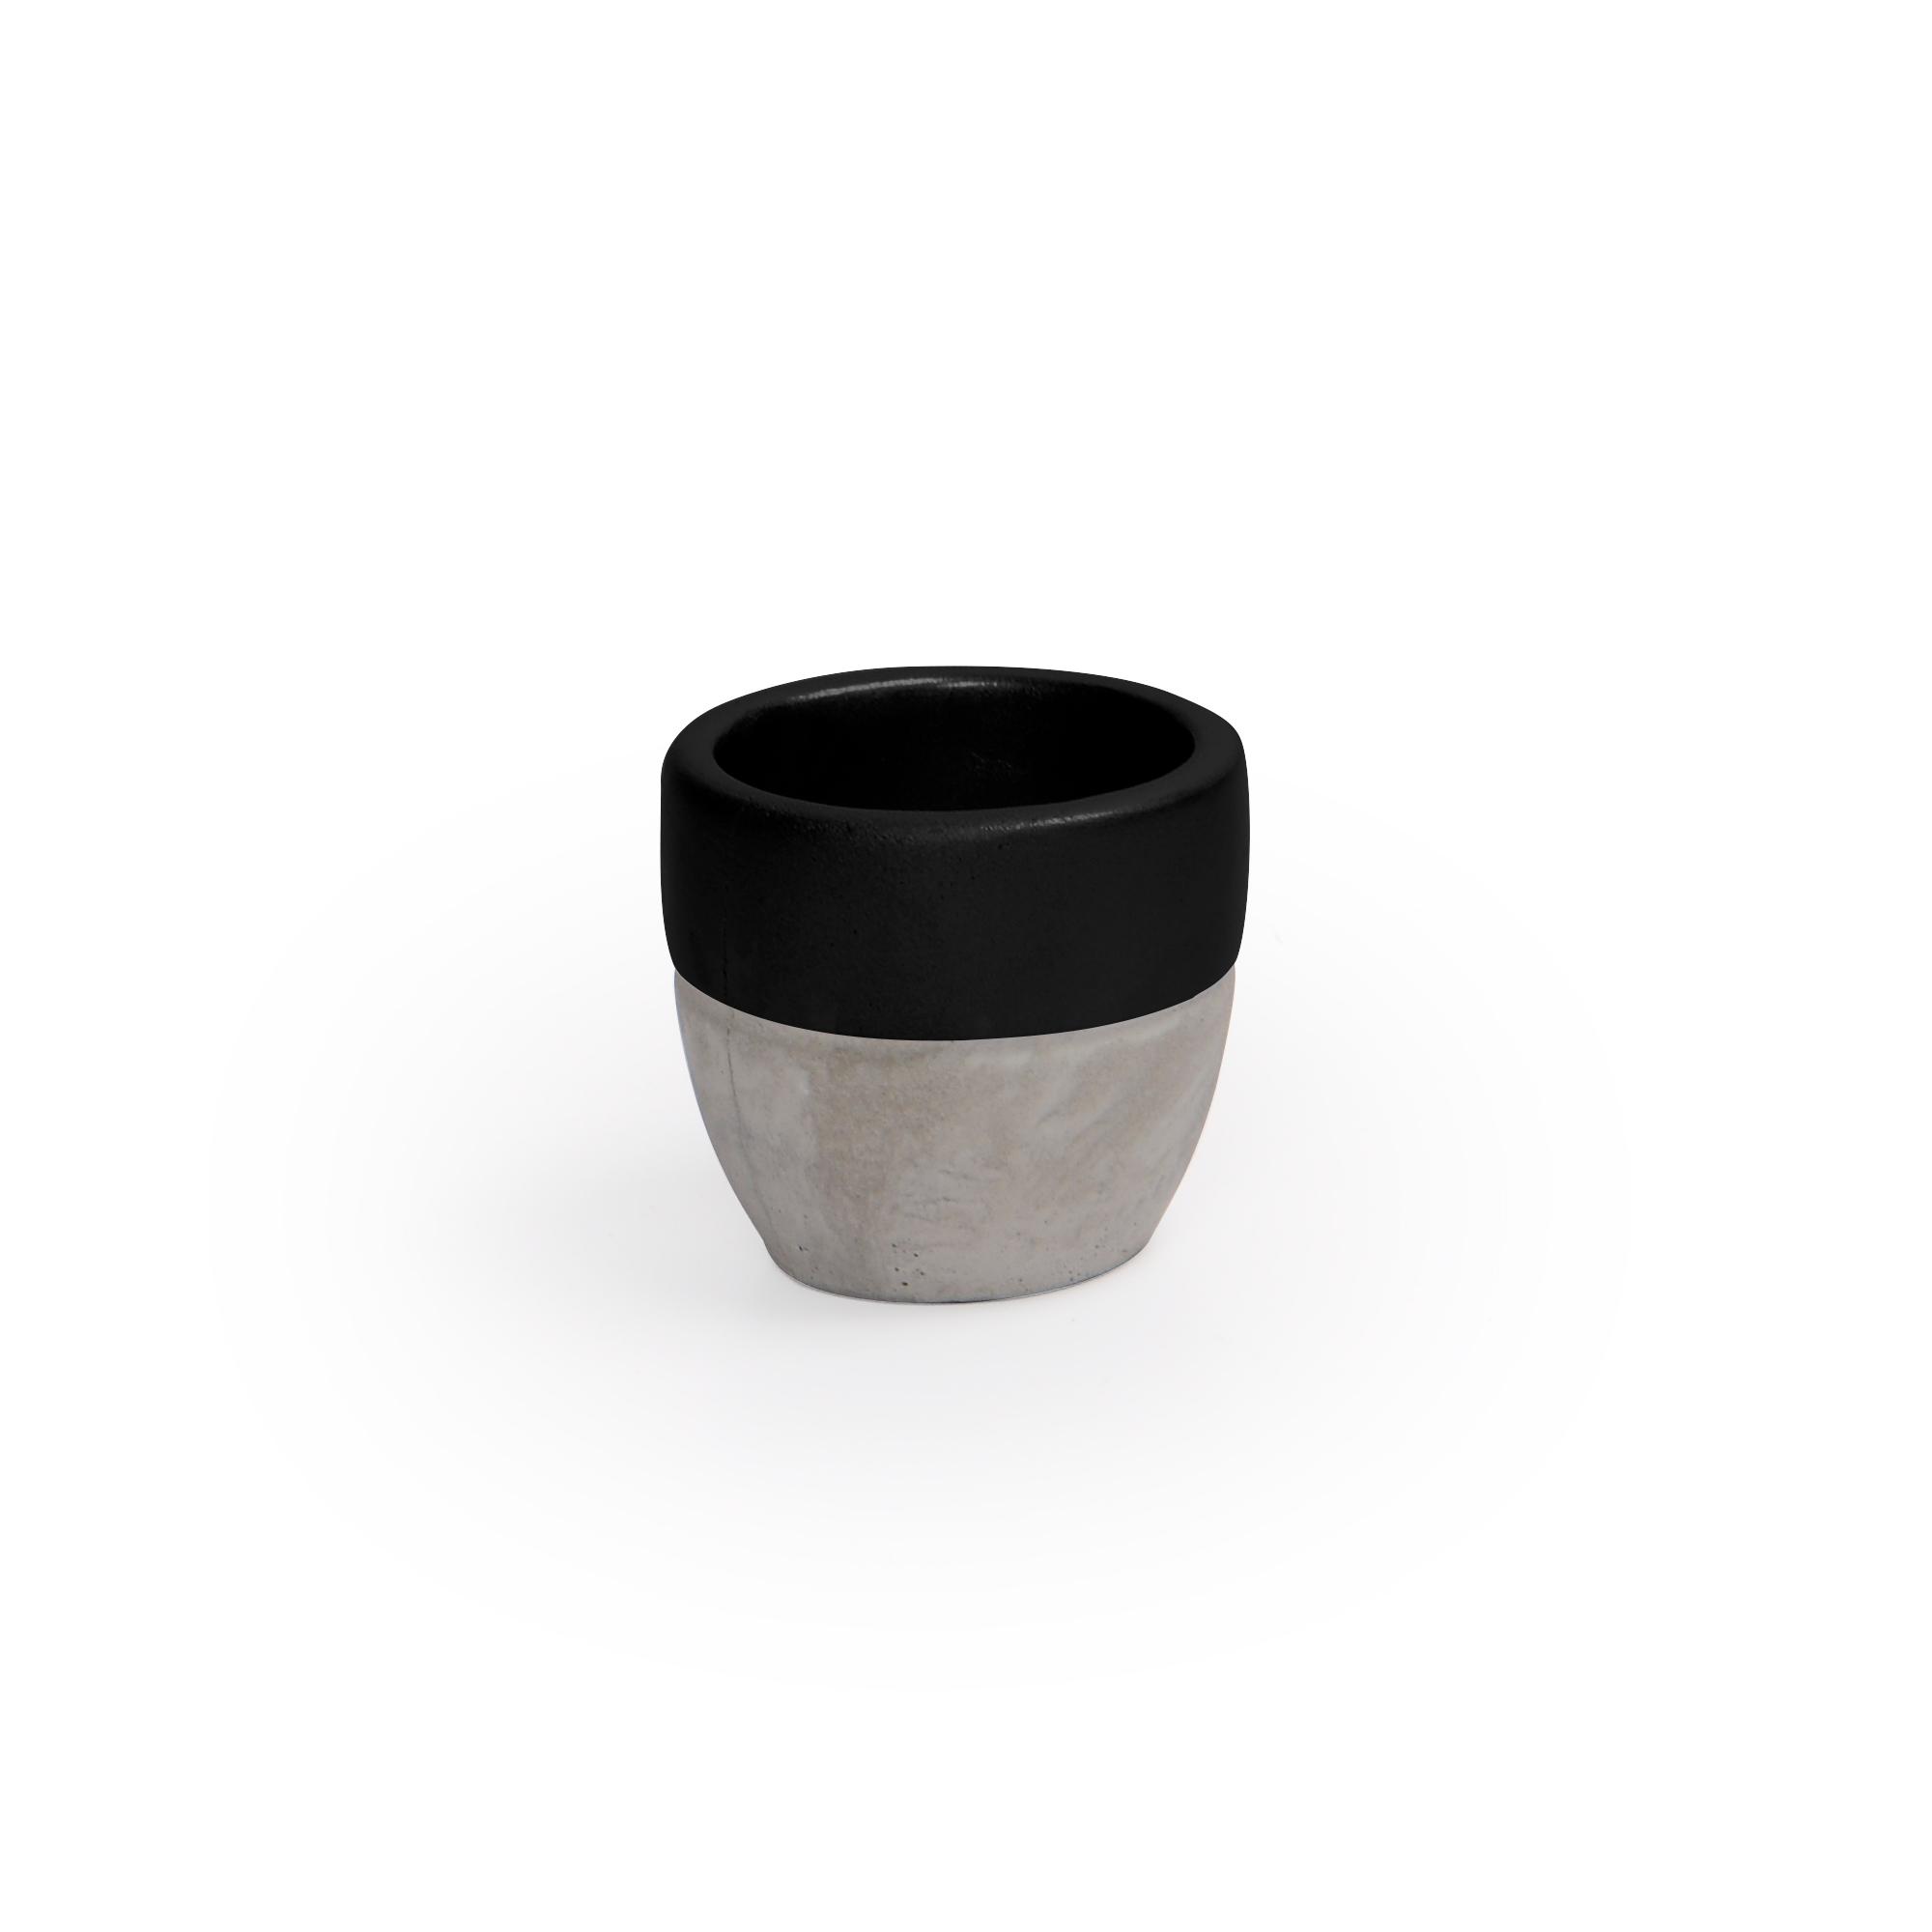 Vaso de Concreto Preto Pequeno